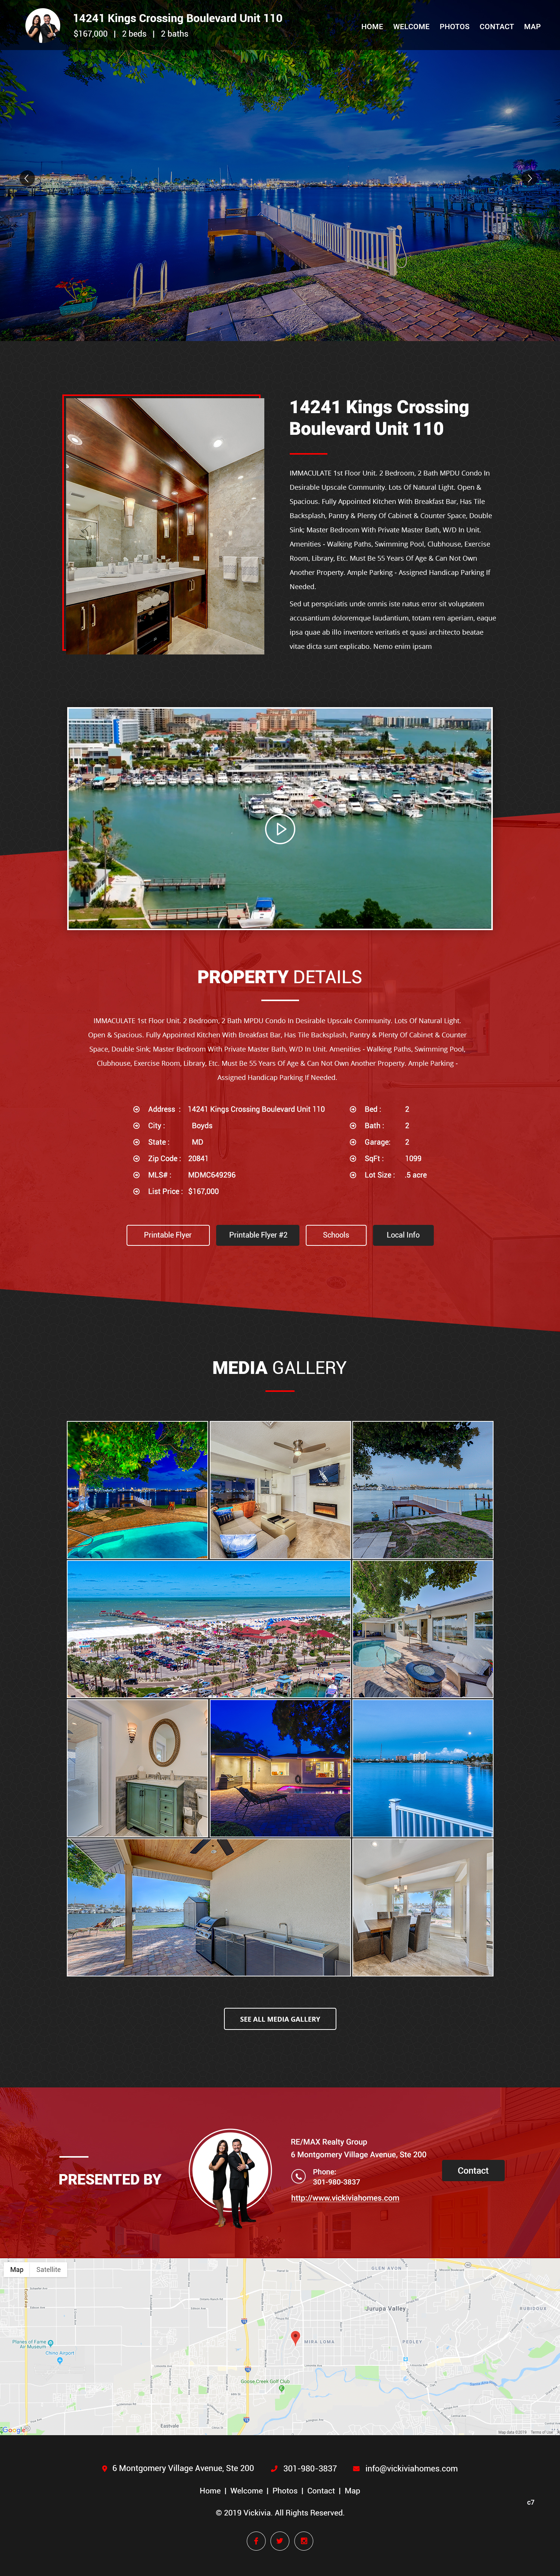 Winning Entry #15 for Website Design contest - Single Real Estate Property Listing Website Template - original